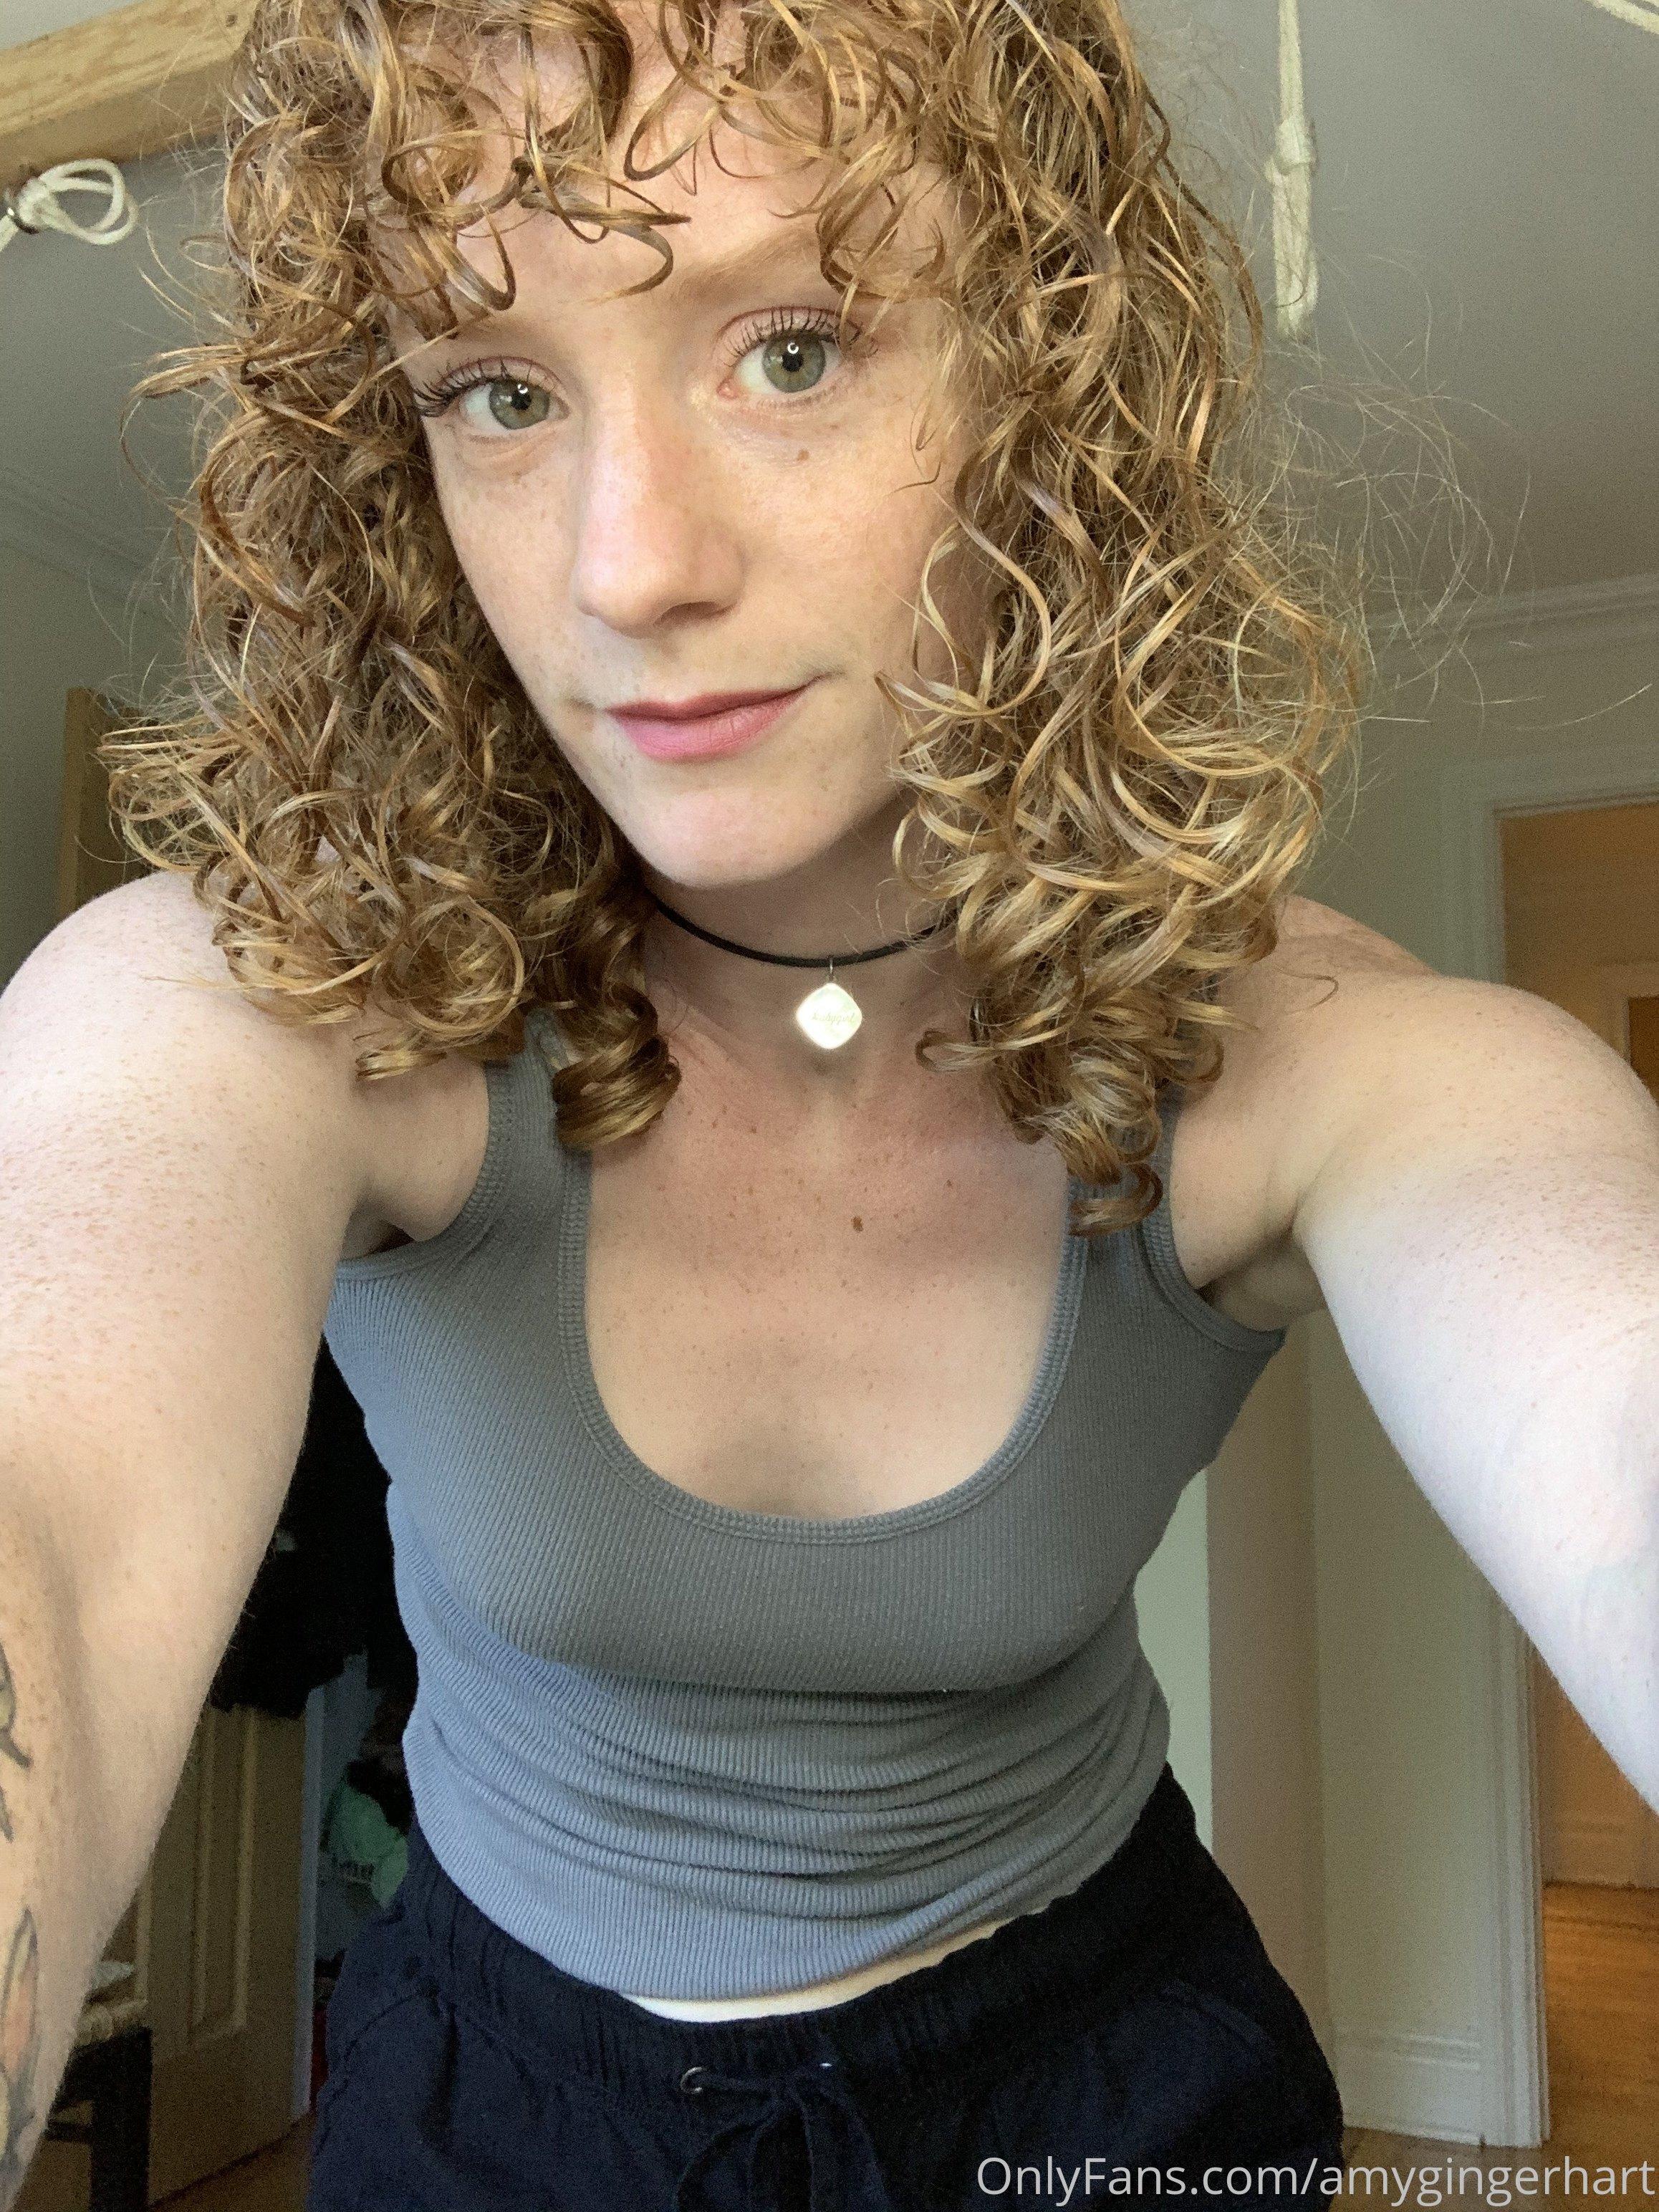 Amy Hart, Amygingerhart, Onlyfans 0292